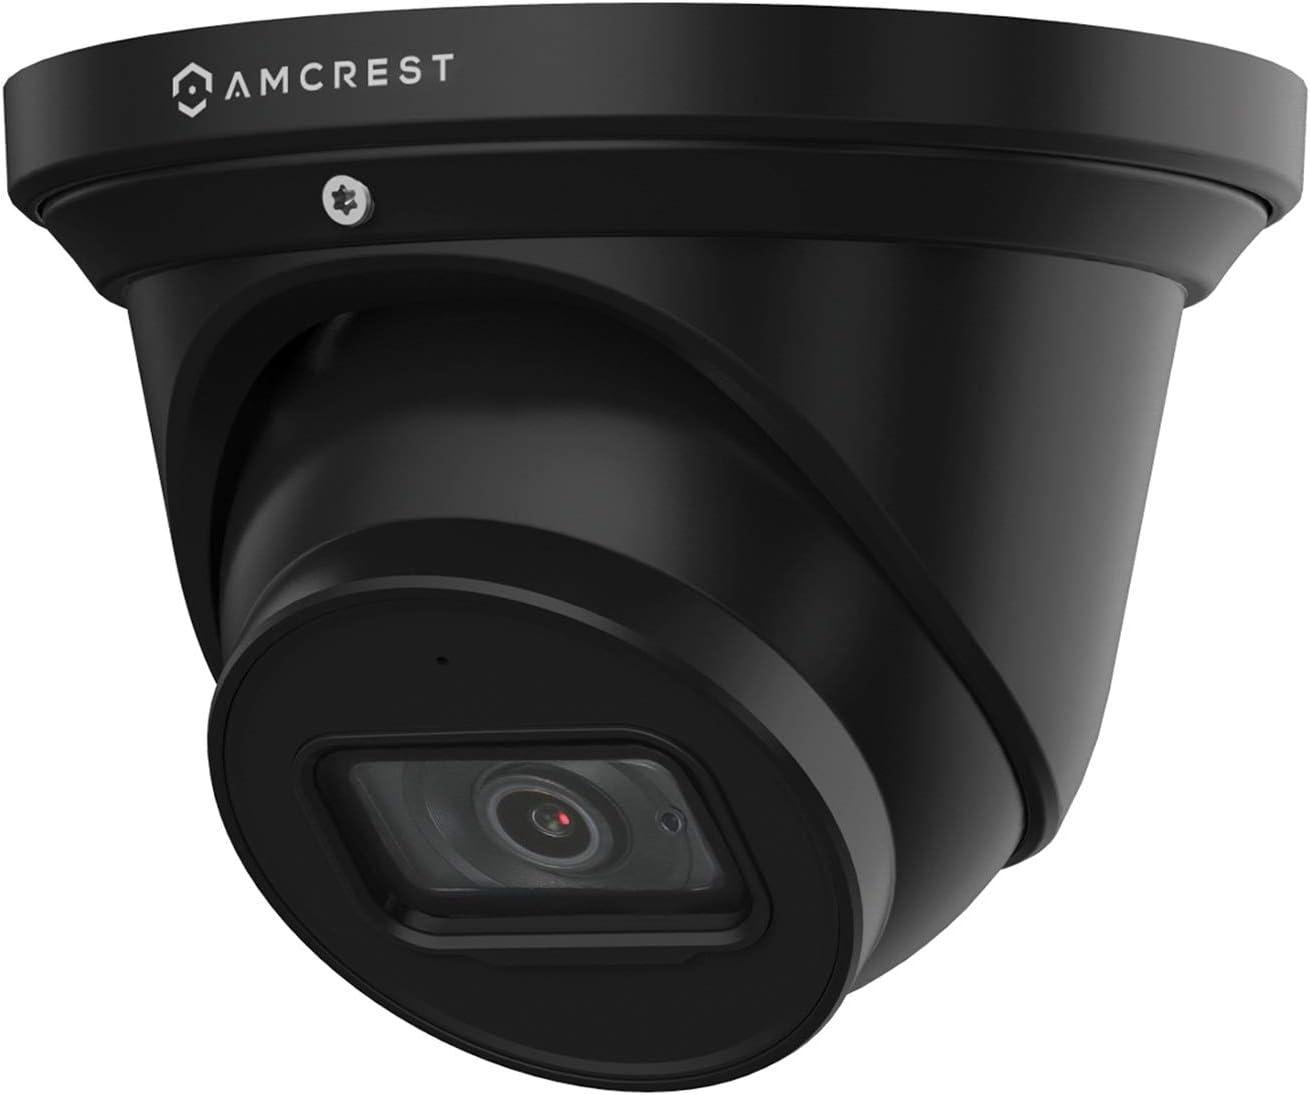 Amcrest ProHD 4K Dome Outdoor Security Camera, 4K (8-Megapixel), Analog Camera, 164ft Night Vision, IP67 Weatherproof Housing, 6mm Lens, 55° Narrow Angle, Built-in Microphone, Black (AMC4KDM6-B)